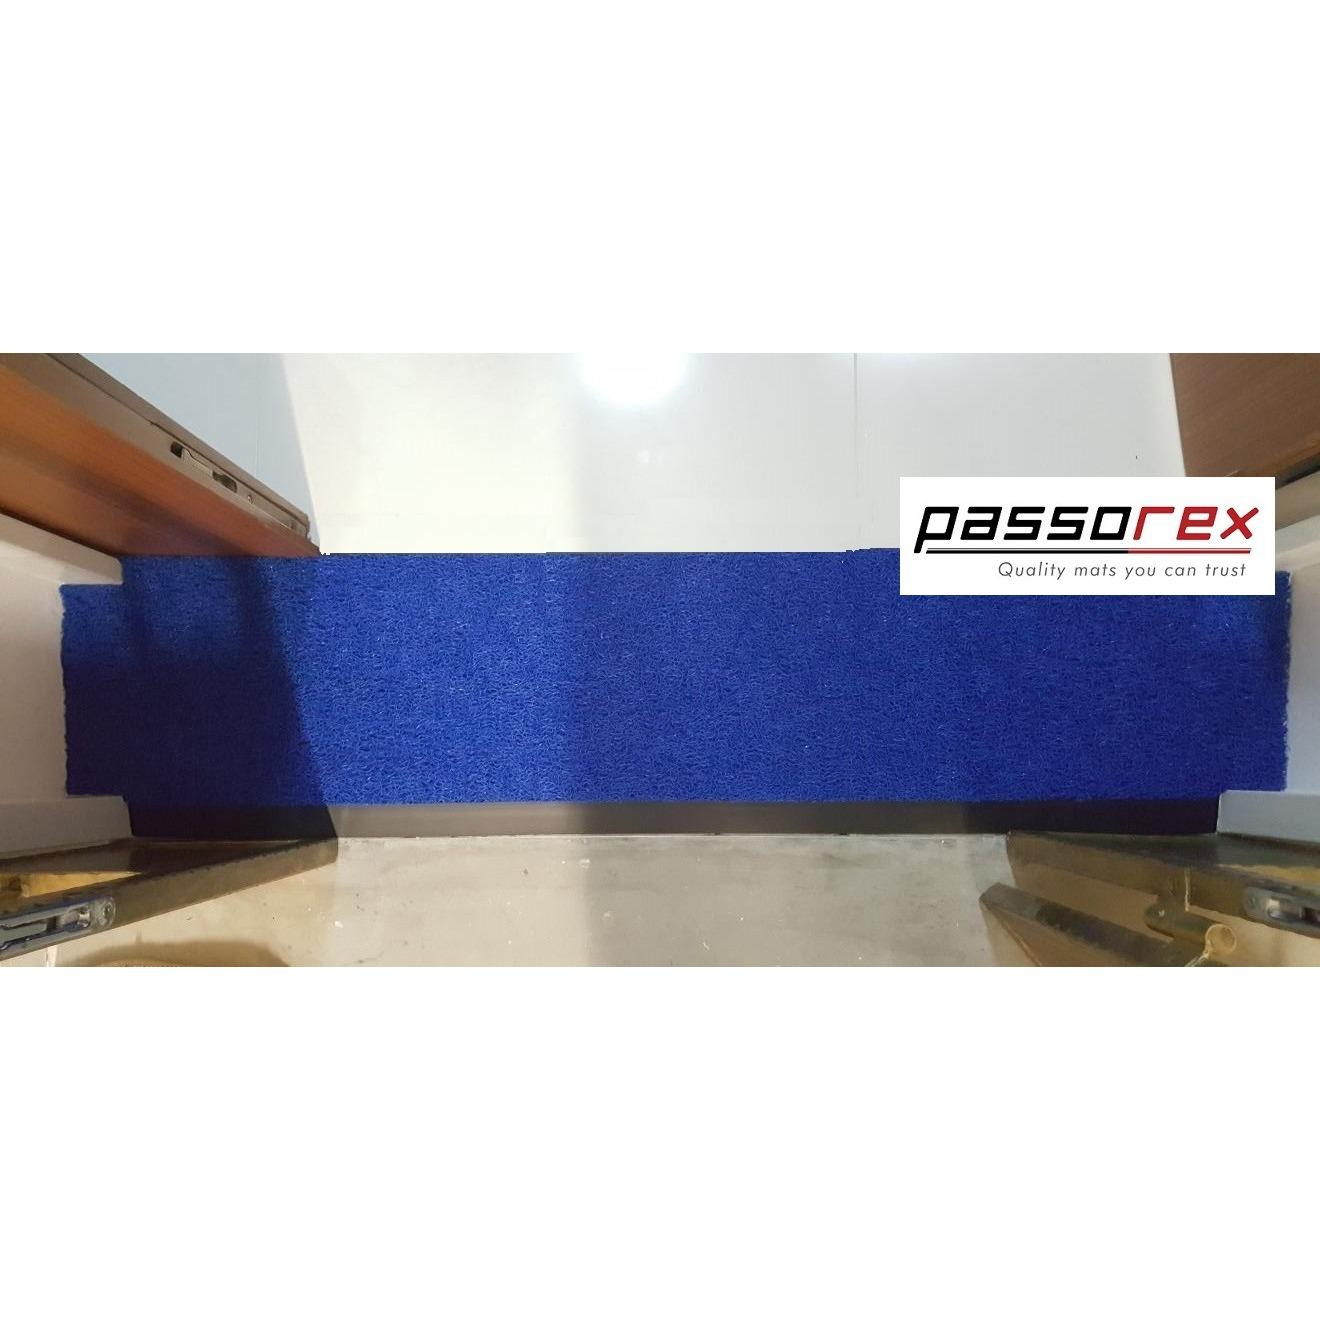 Passorex BTO HDB Door Gap Floor Mat | L120cm x 29cm @ L125cm x 27cm | Mat thickness T13mm+/- | Blue